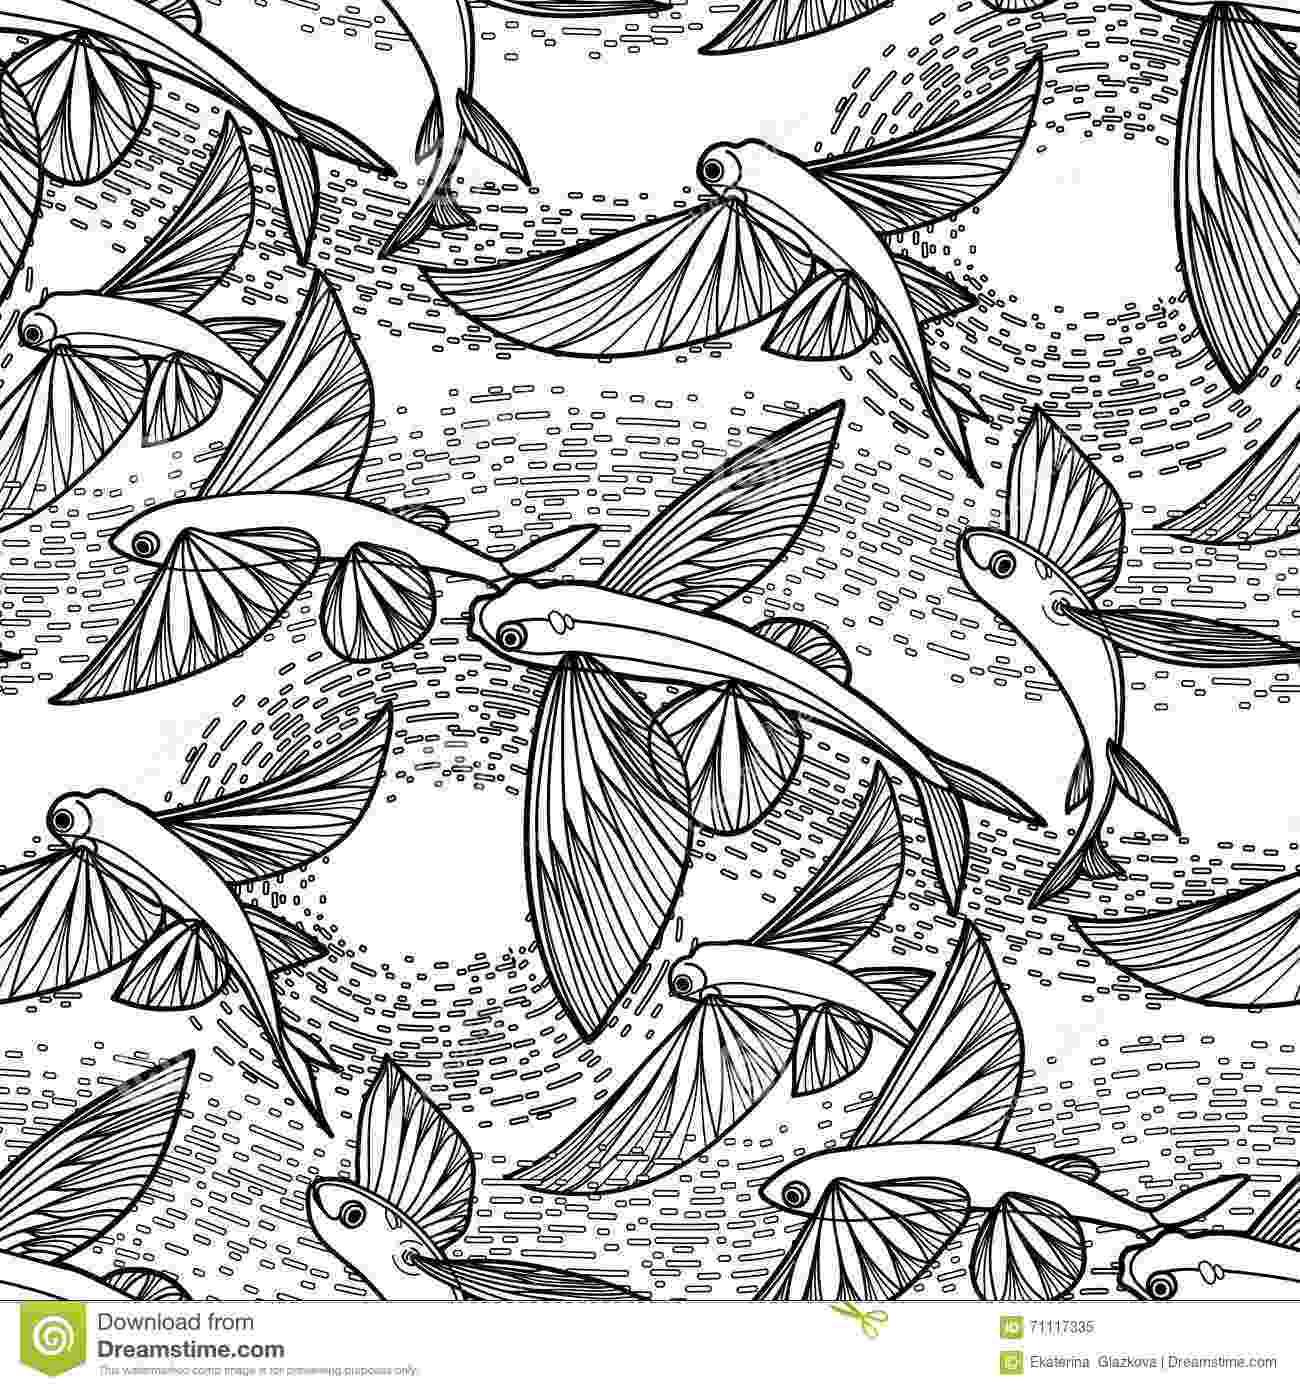 flying fish coloring page flying fish coloring page flying fish page coloring